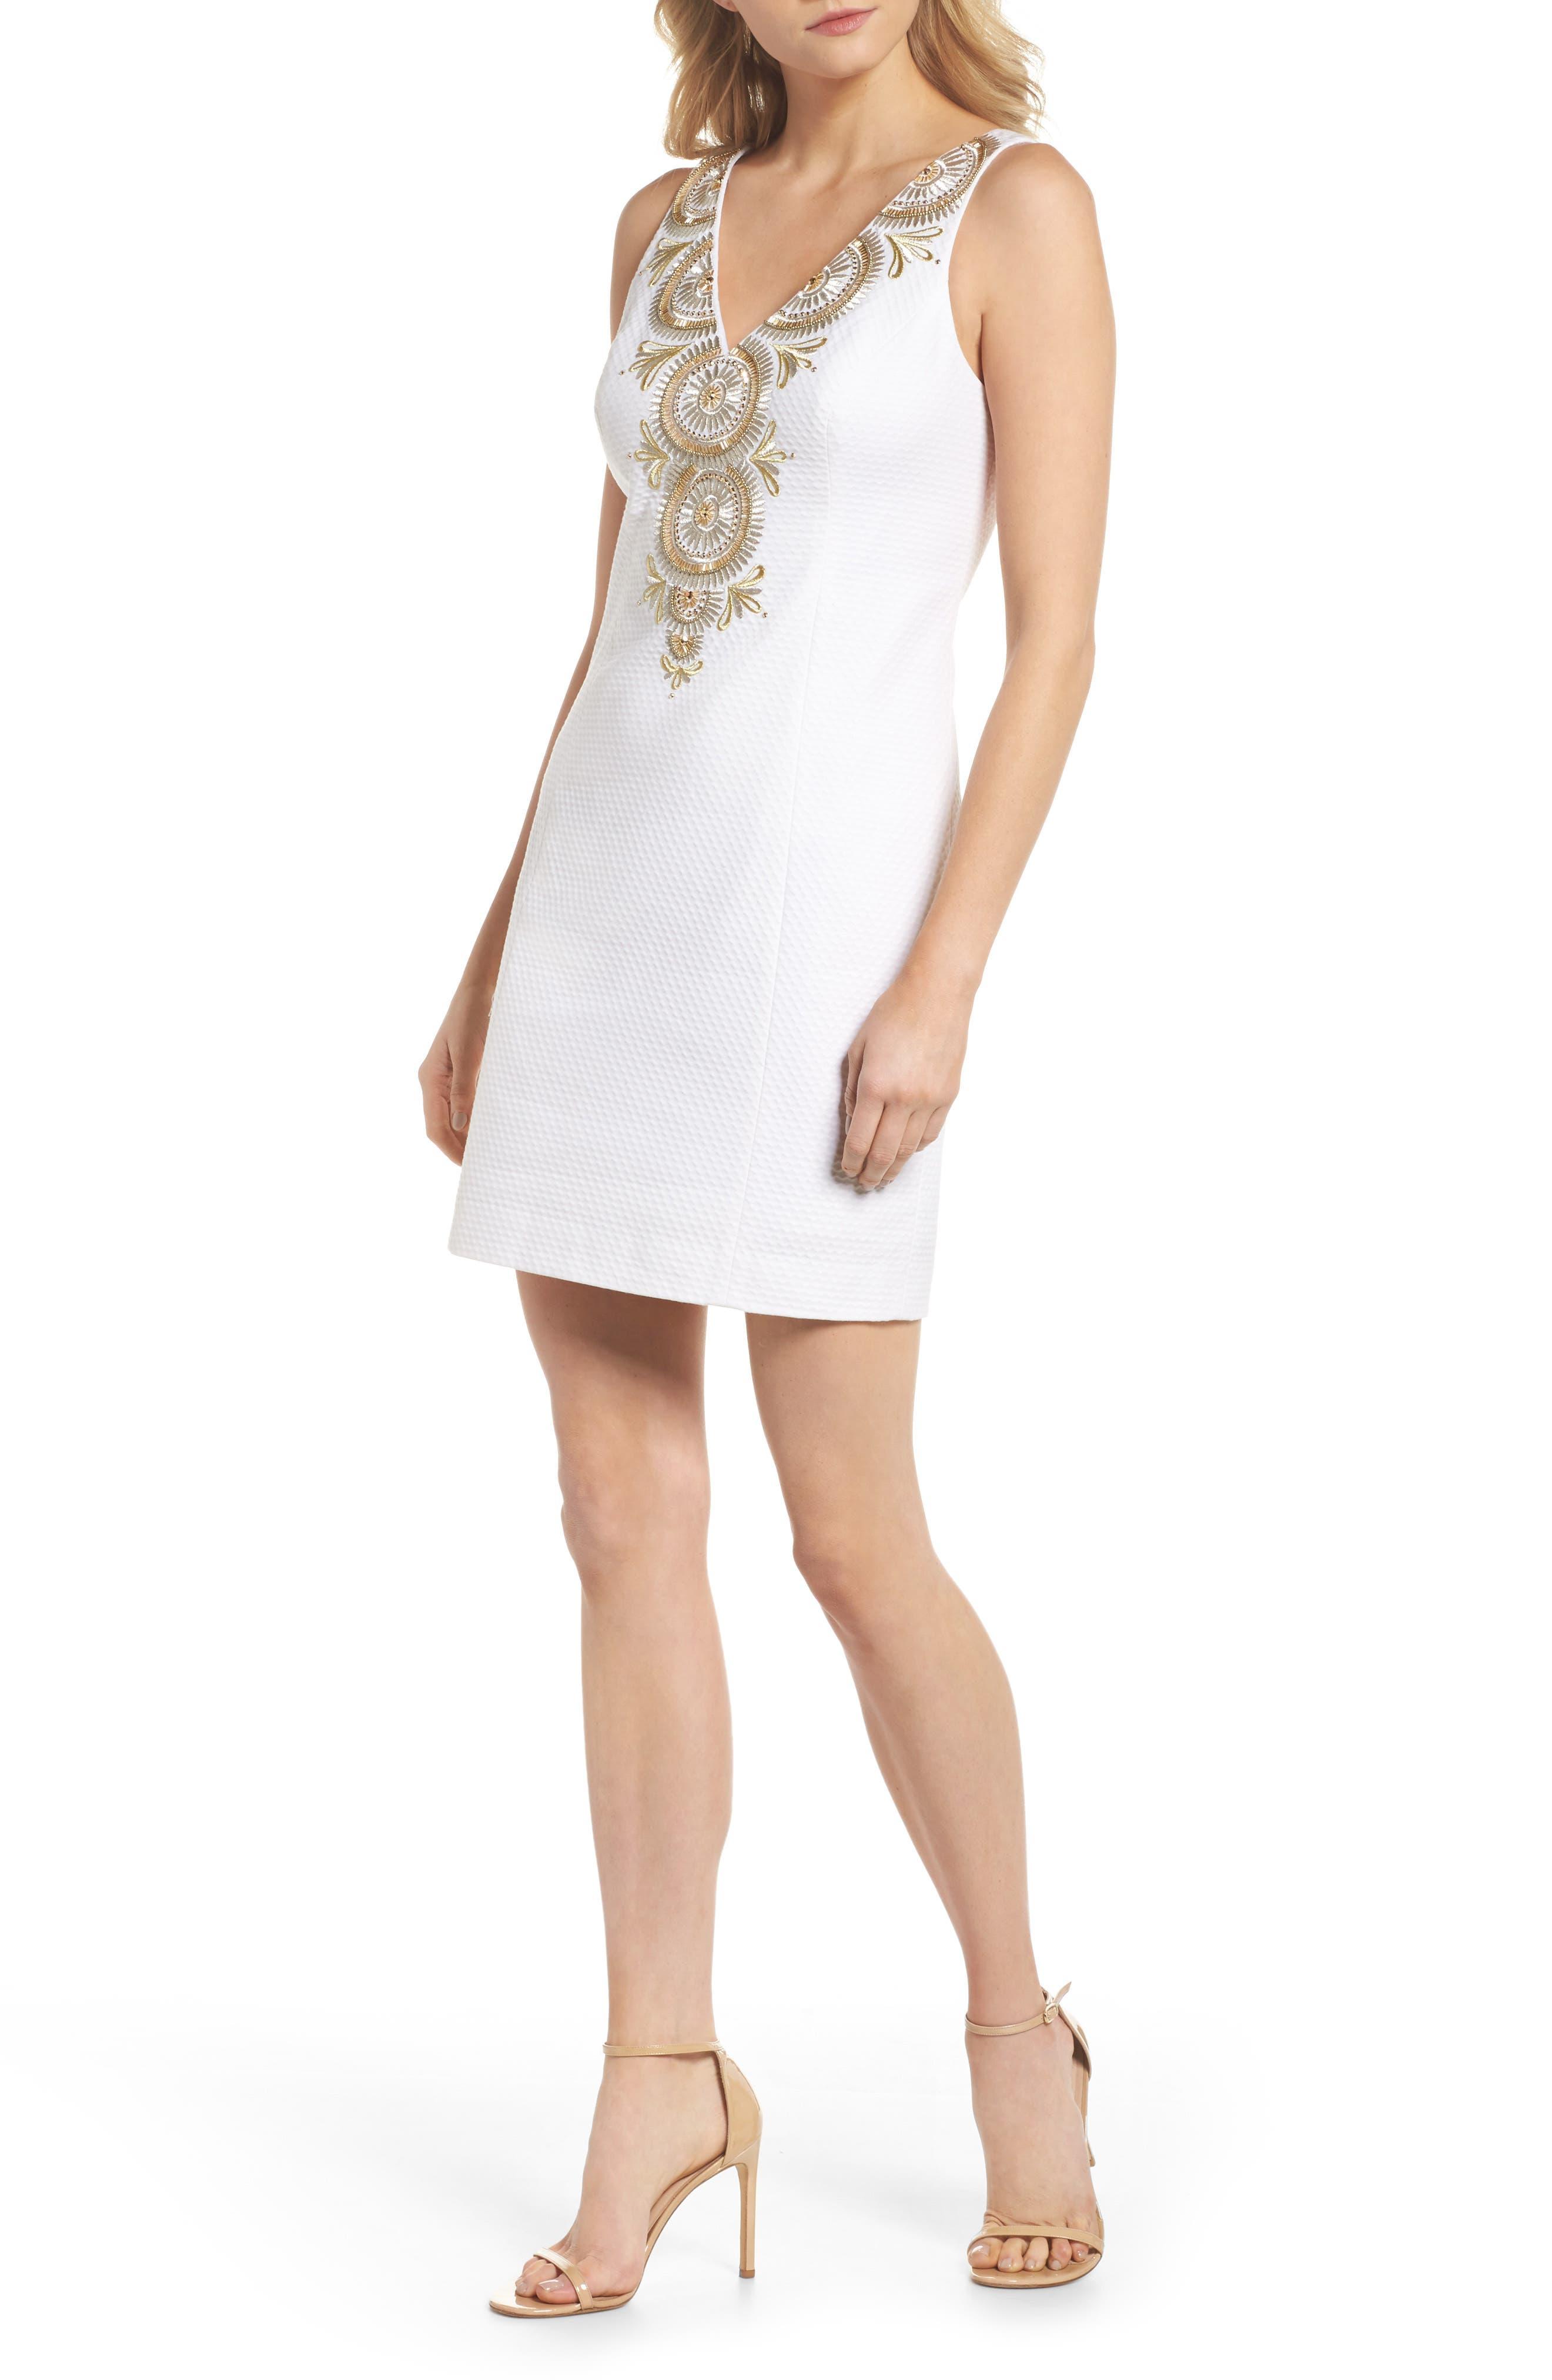 Main Image - Lilly Pulitzer® Gabby Metallic Sheath Dress